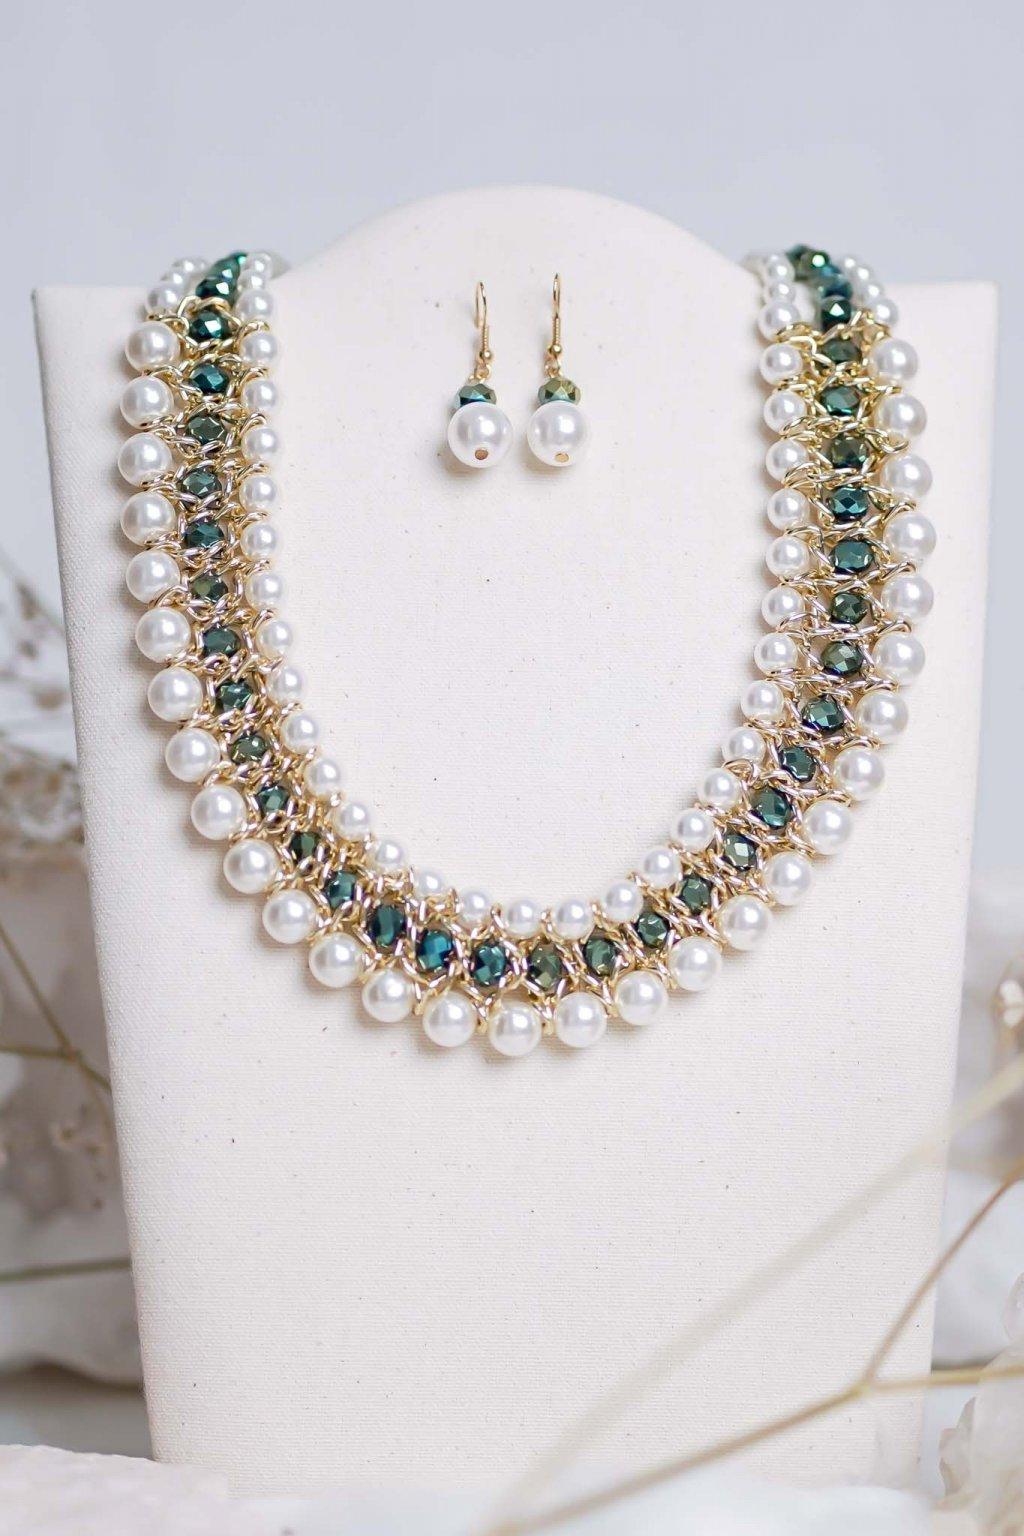 náhrdelník, šperk, spoločenská náhrdelník, náhrdelník na bežný deň, výrazný náhrdelník, jemný náhrdelník, šperky, náhrdelník na ples, svadbu, stužkovú 47